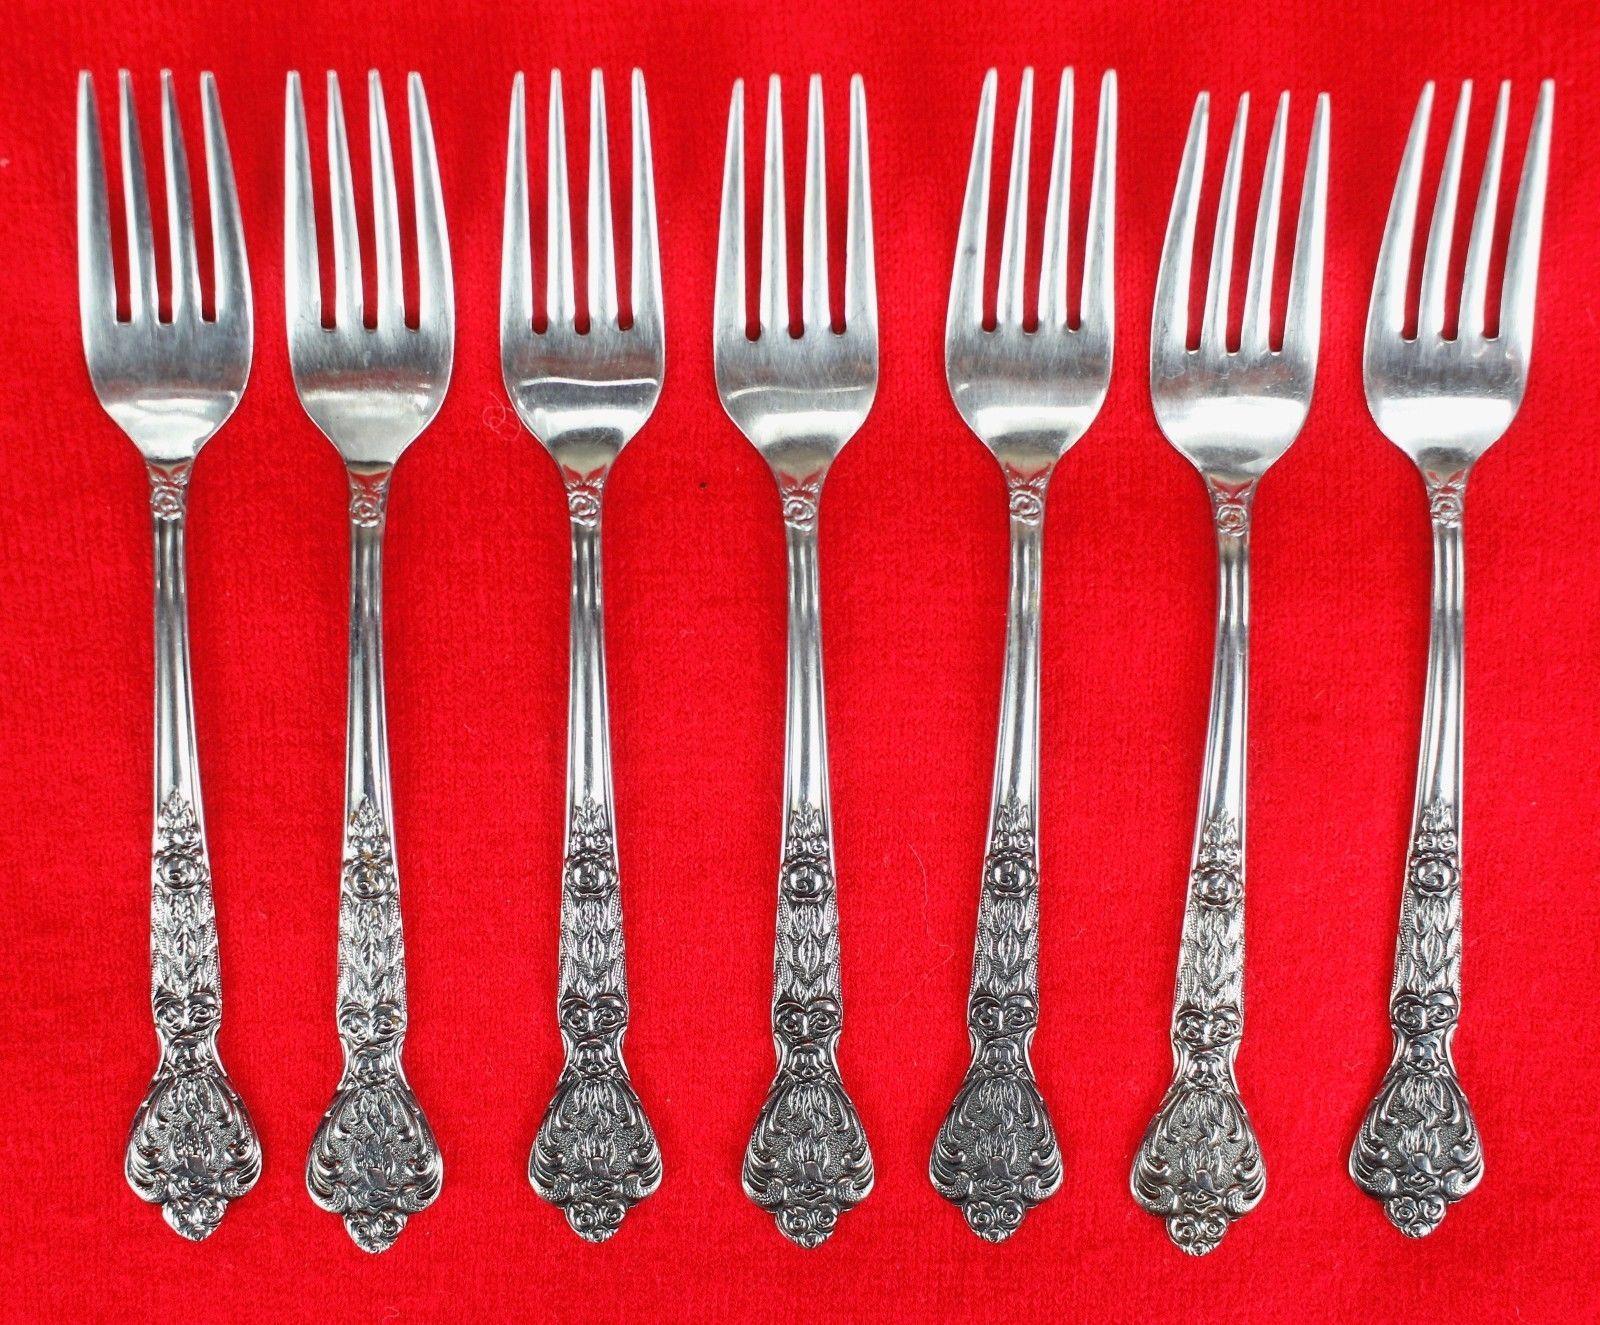 7X Salad Dessert Forks Merchandise Service Versailles Stainless Glossy Flatware